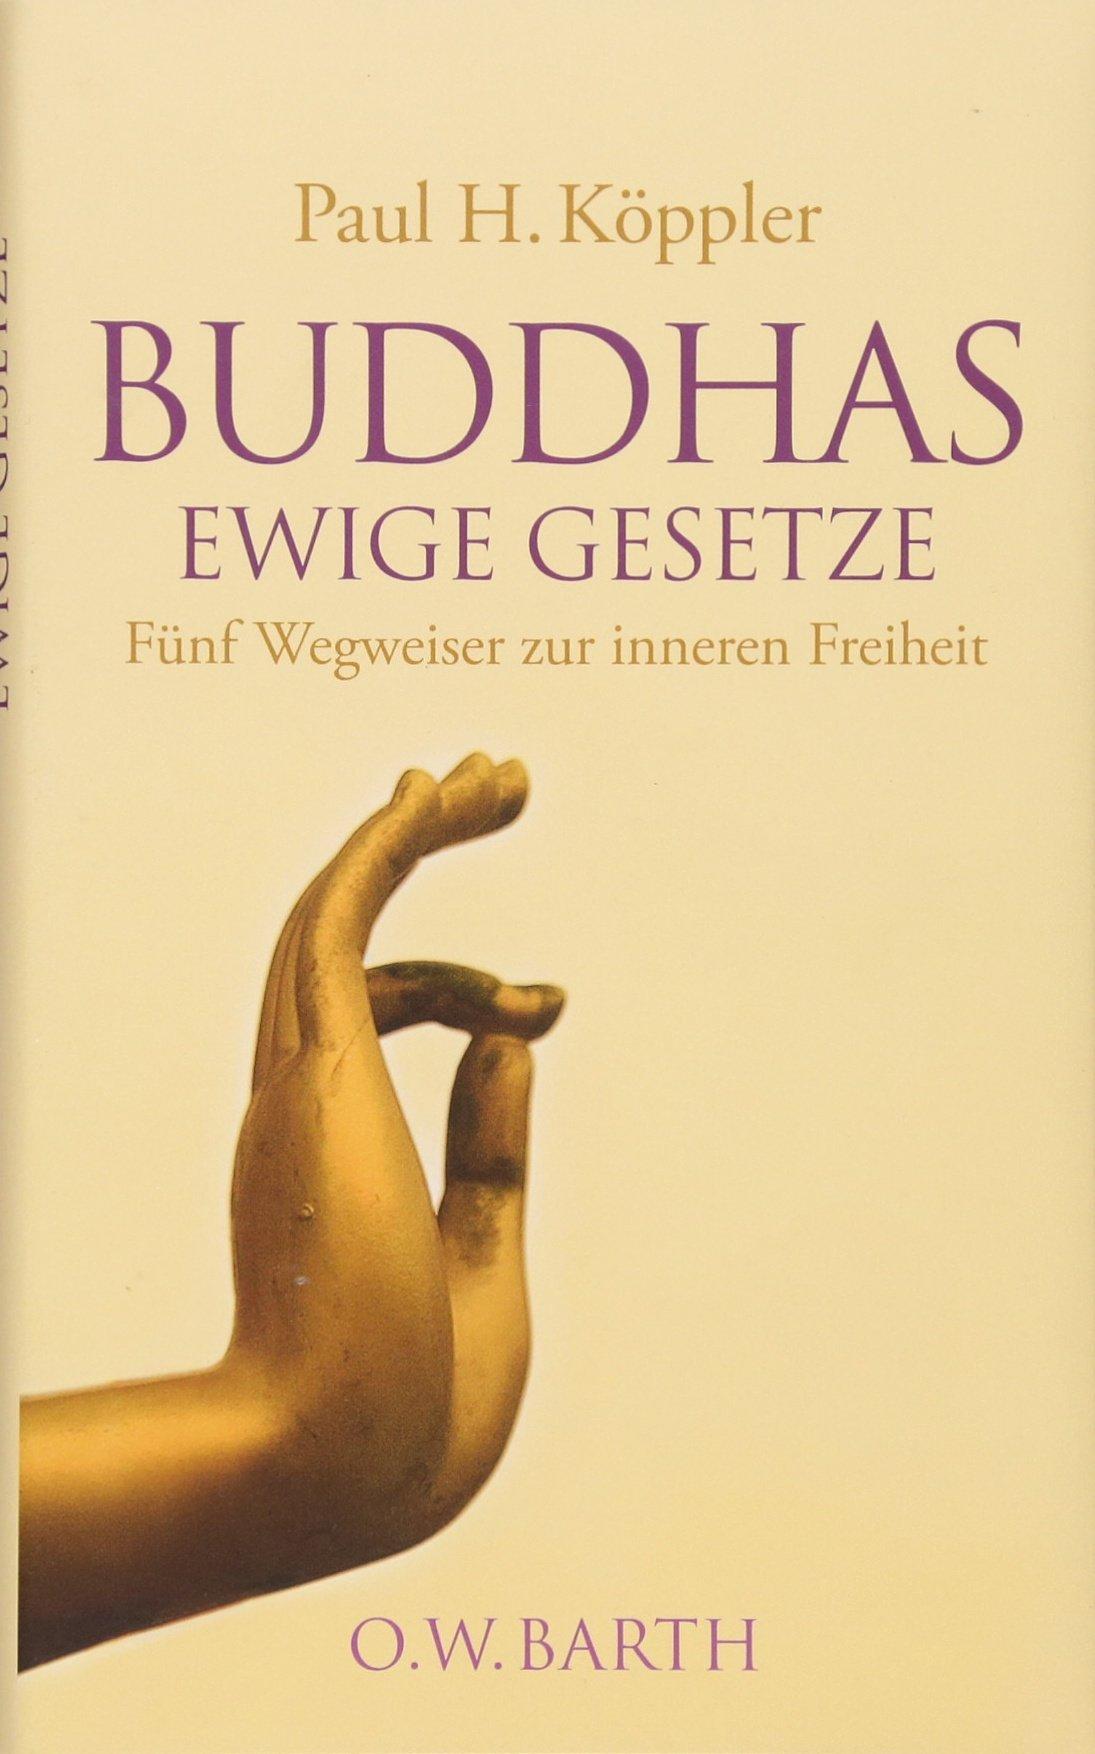 Image result for paul köppler buddhas ewigen gesetze